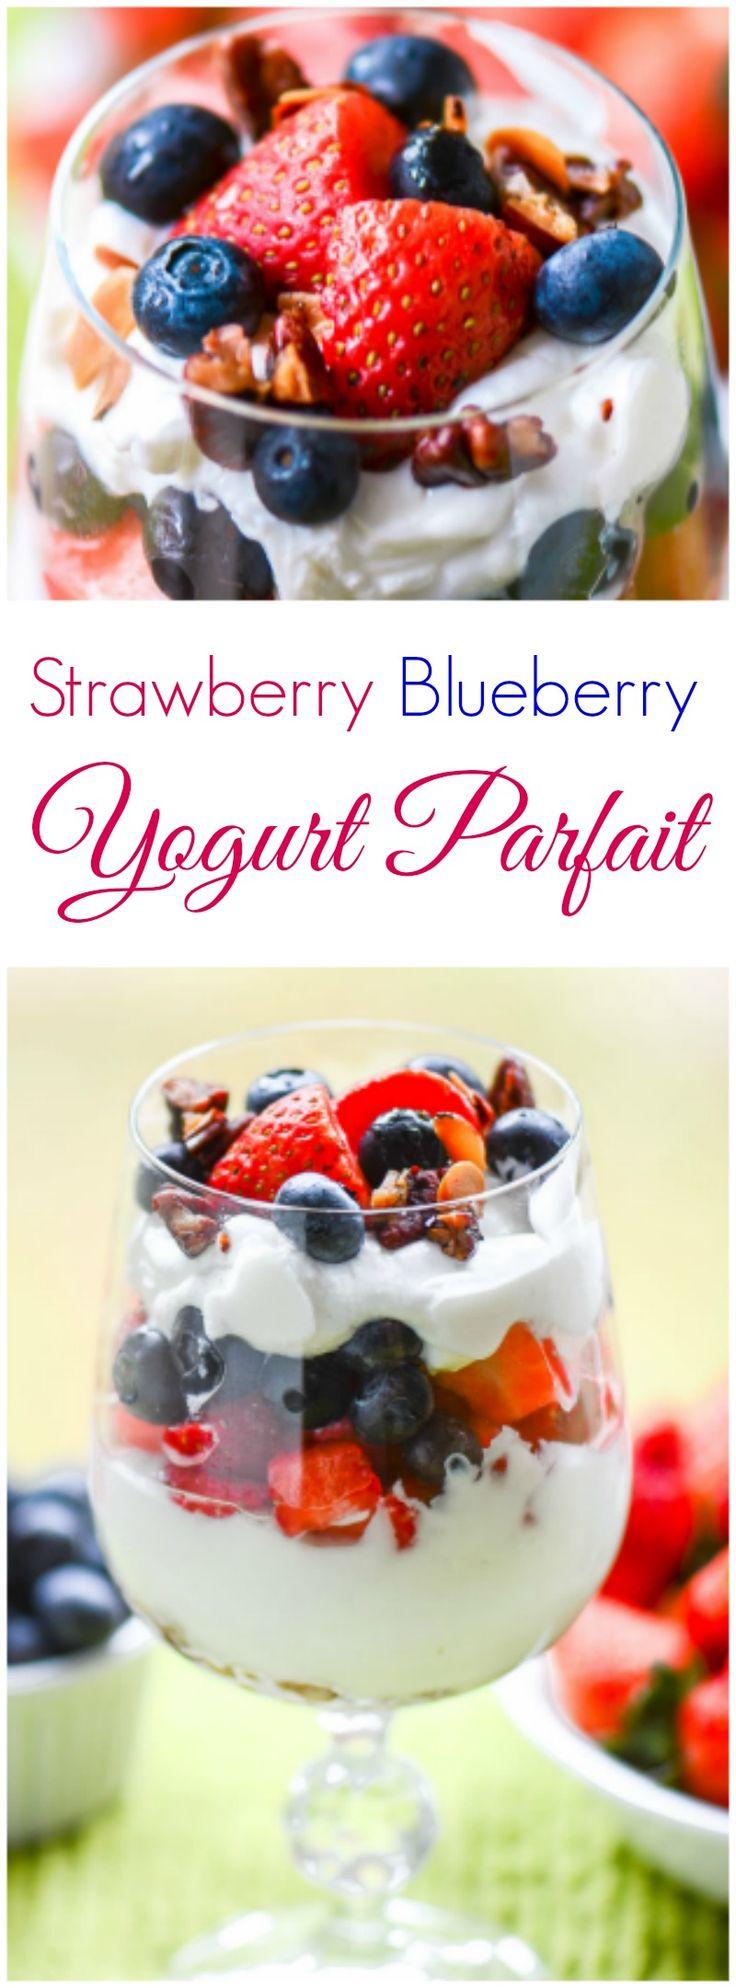 Strawberry Blueberry Yogurt Parfaits are sweet, creamy, crunchy healthy desserts made with fresh strawberries, blueberries, and organic greek yogurt.